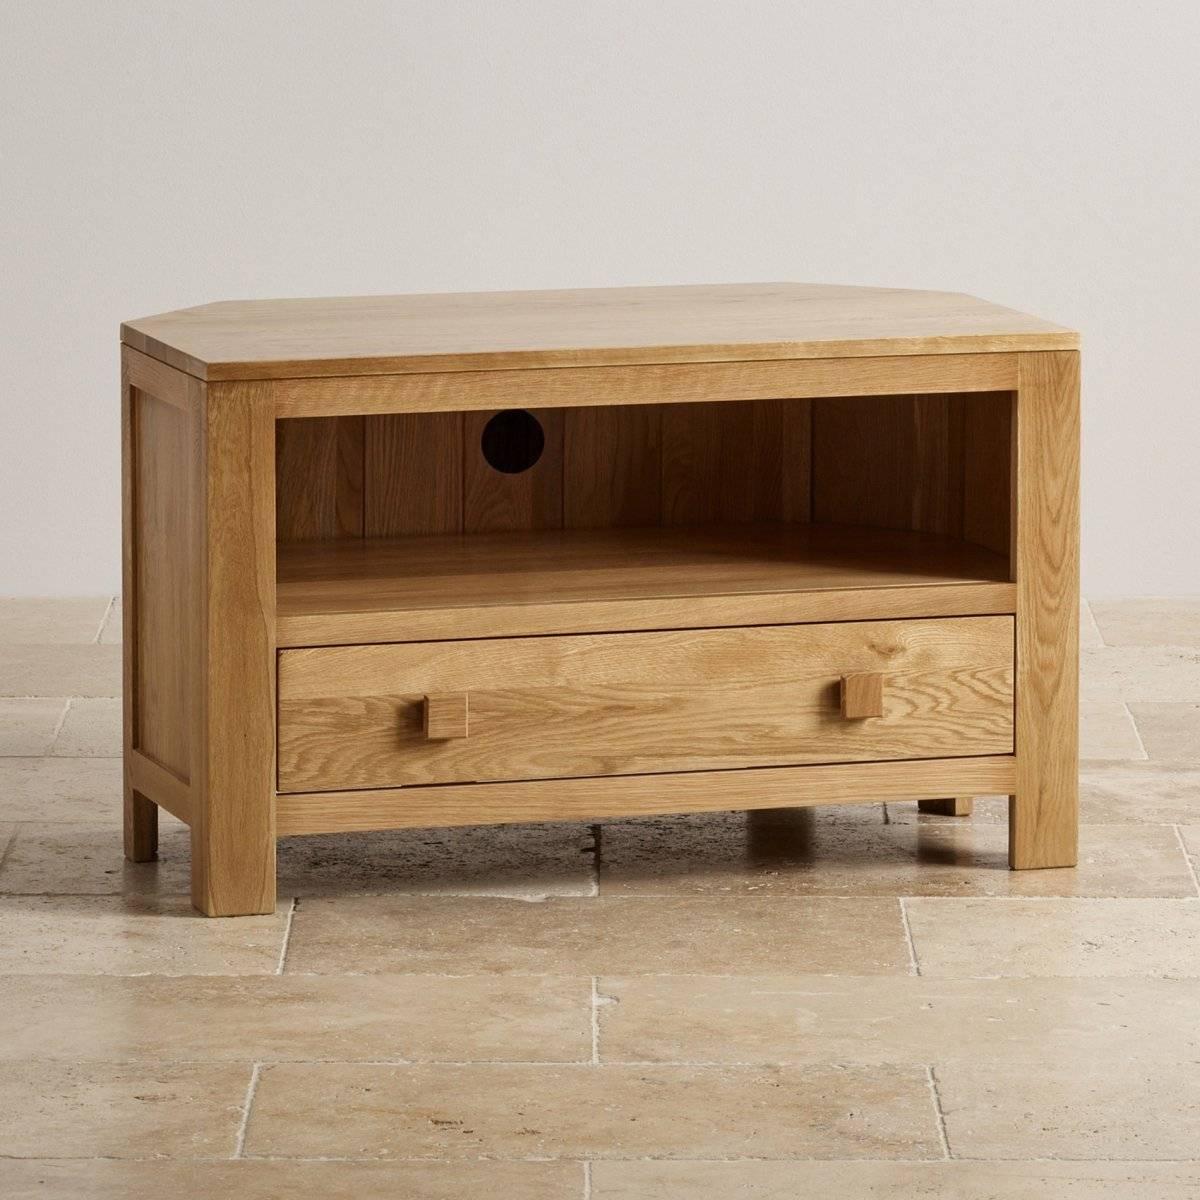 Oakdale Corner Tv Cabinet In Solid Oak | Oak Furniture Land With Regard To Corner Oak Tv Stands (View 8 of 15)